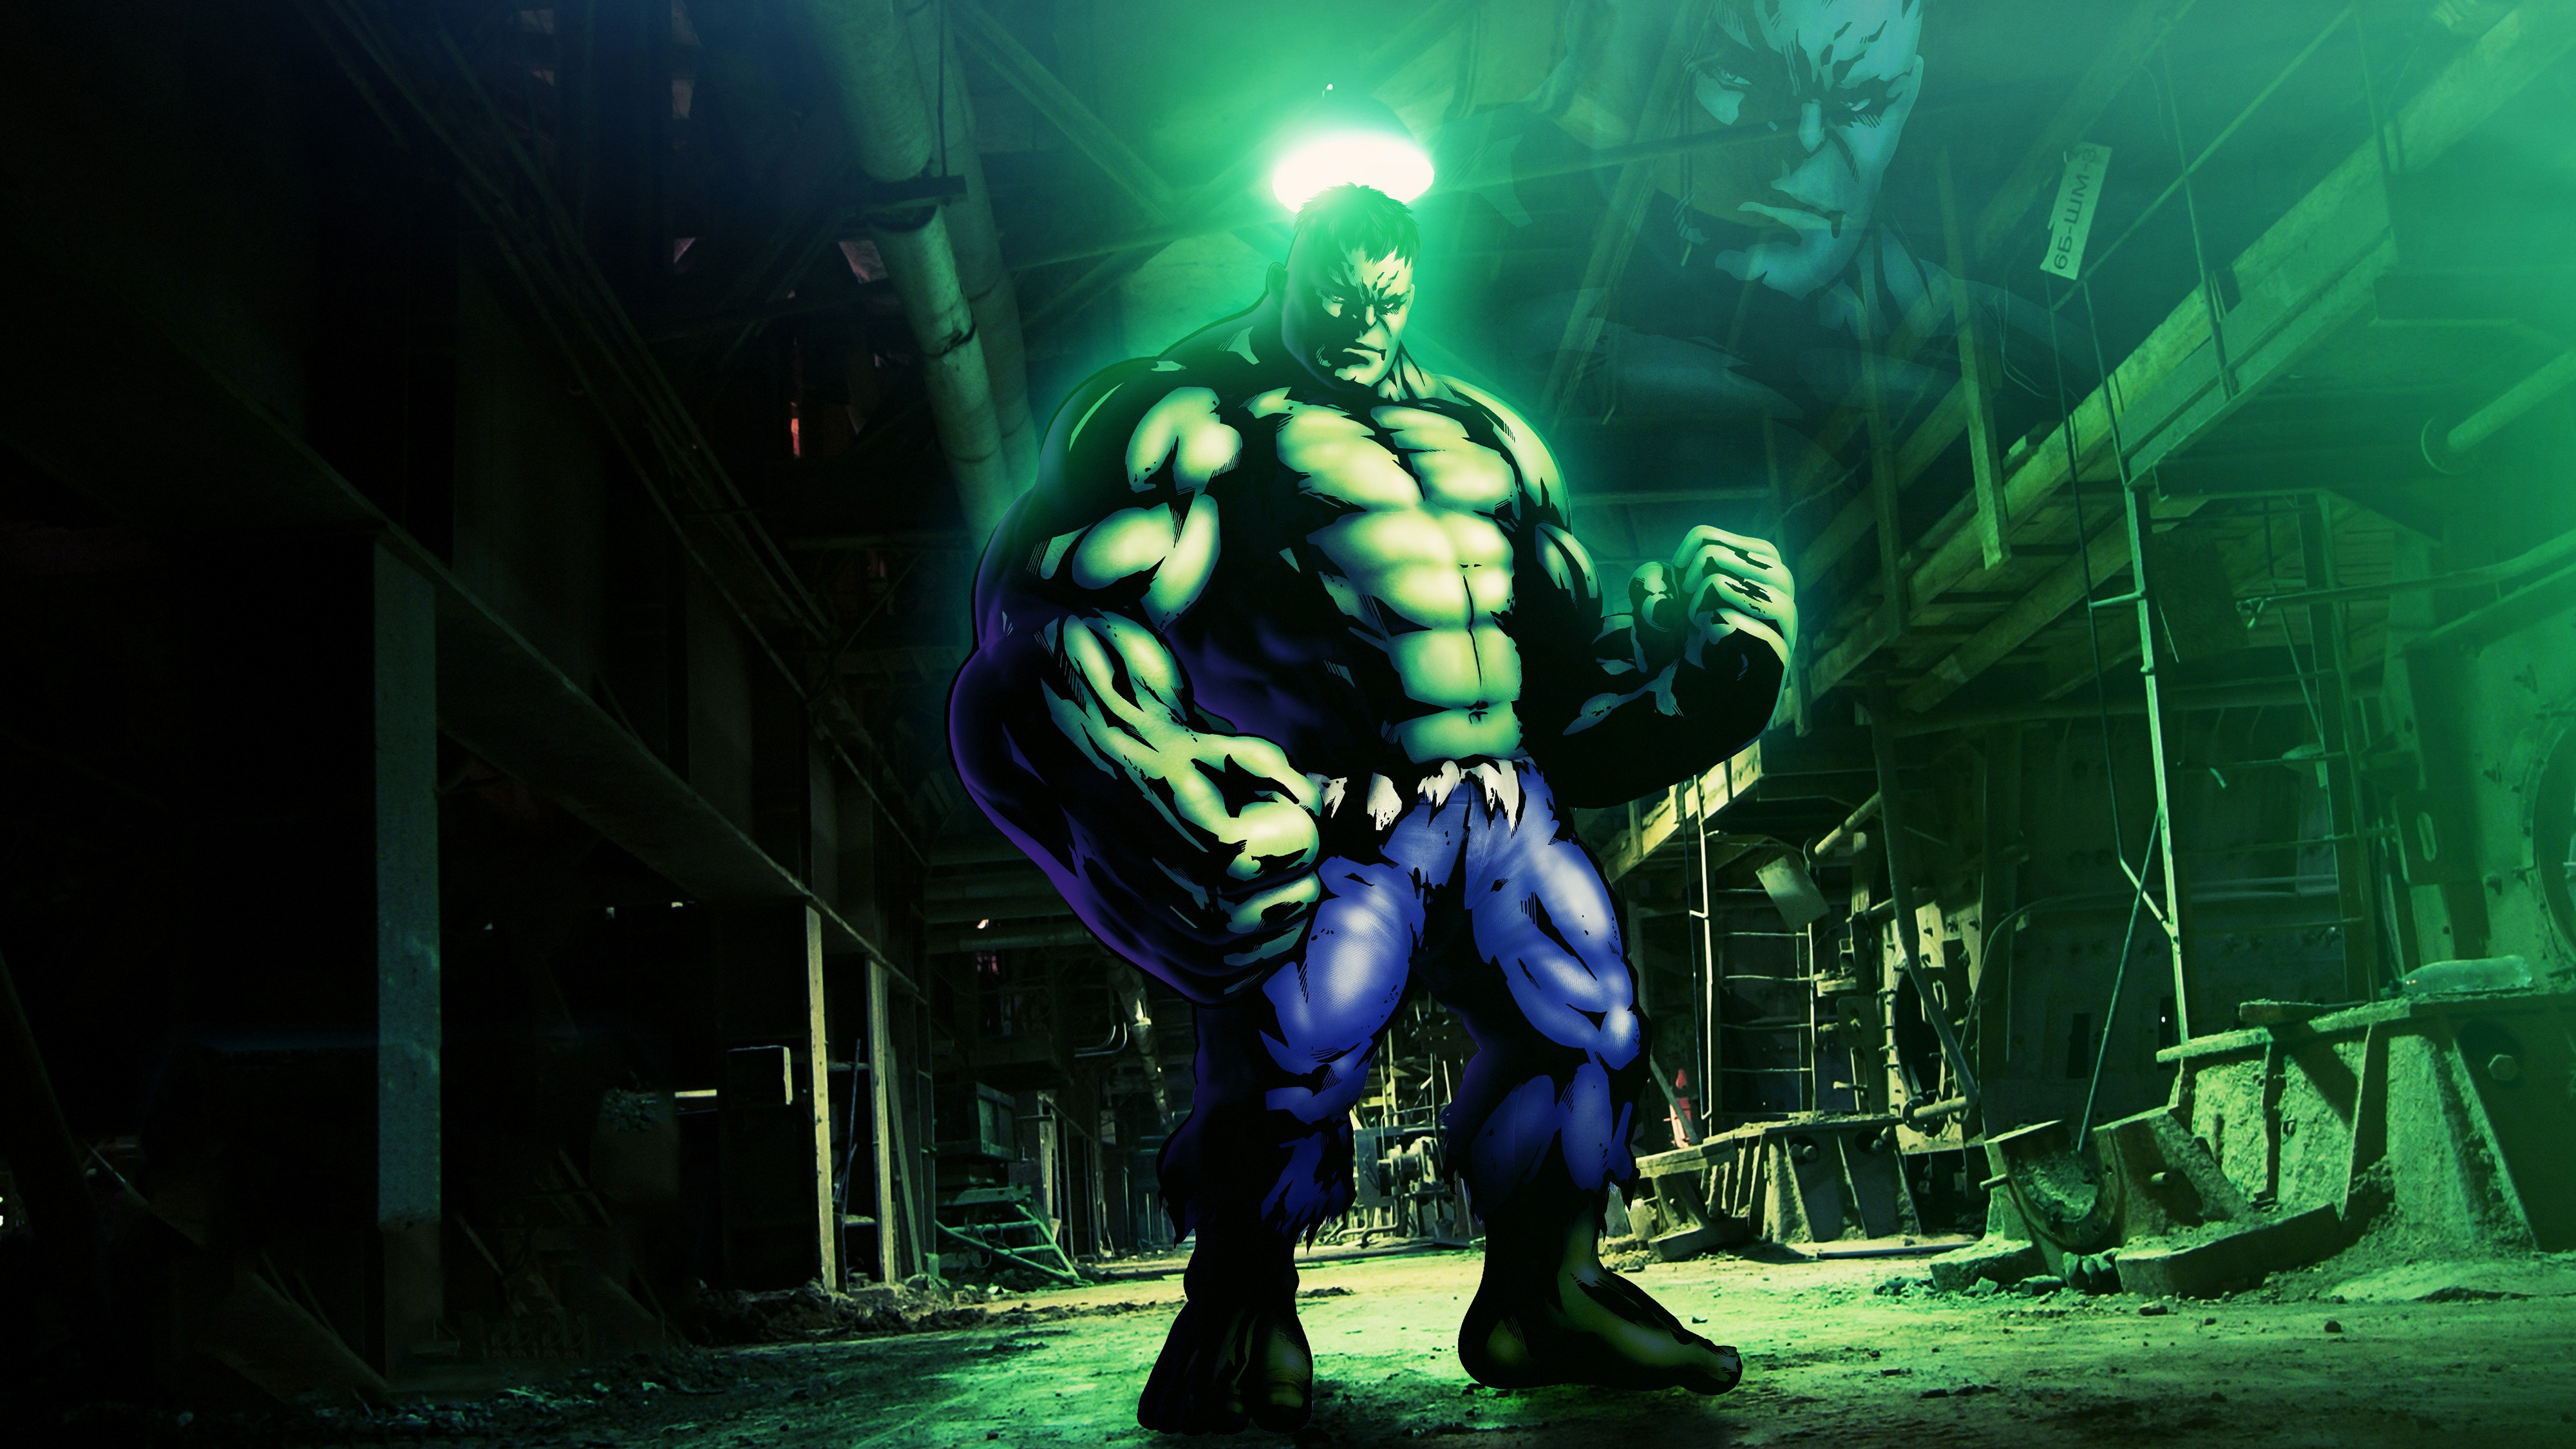 Hulk 4K Wallpapers HD Wallpapers 4000x2250